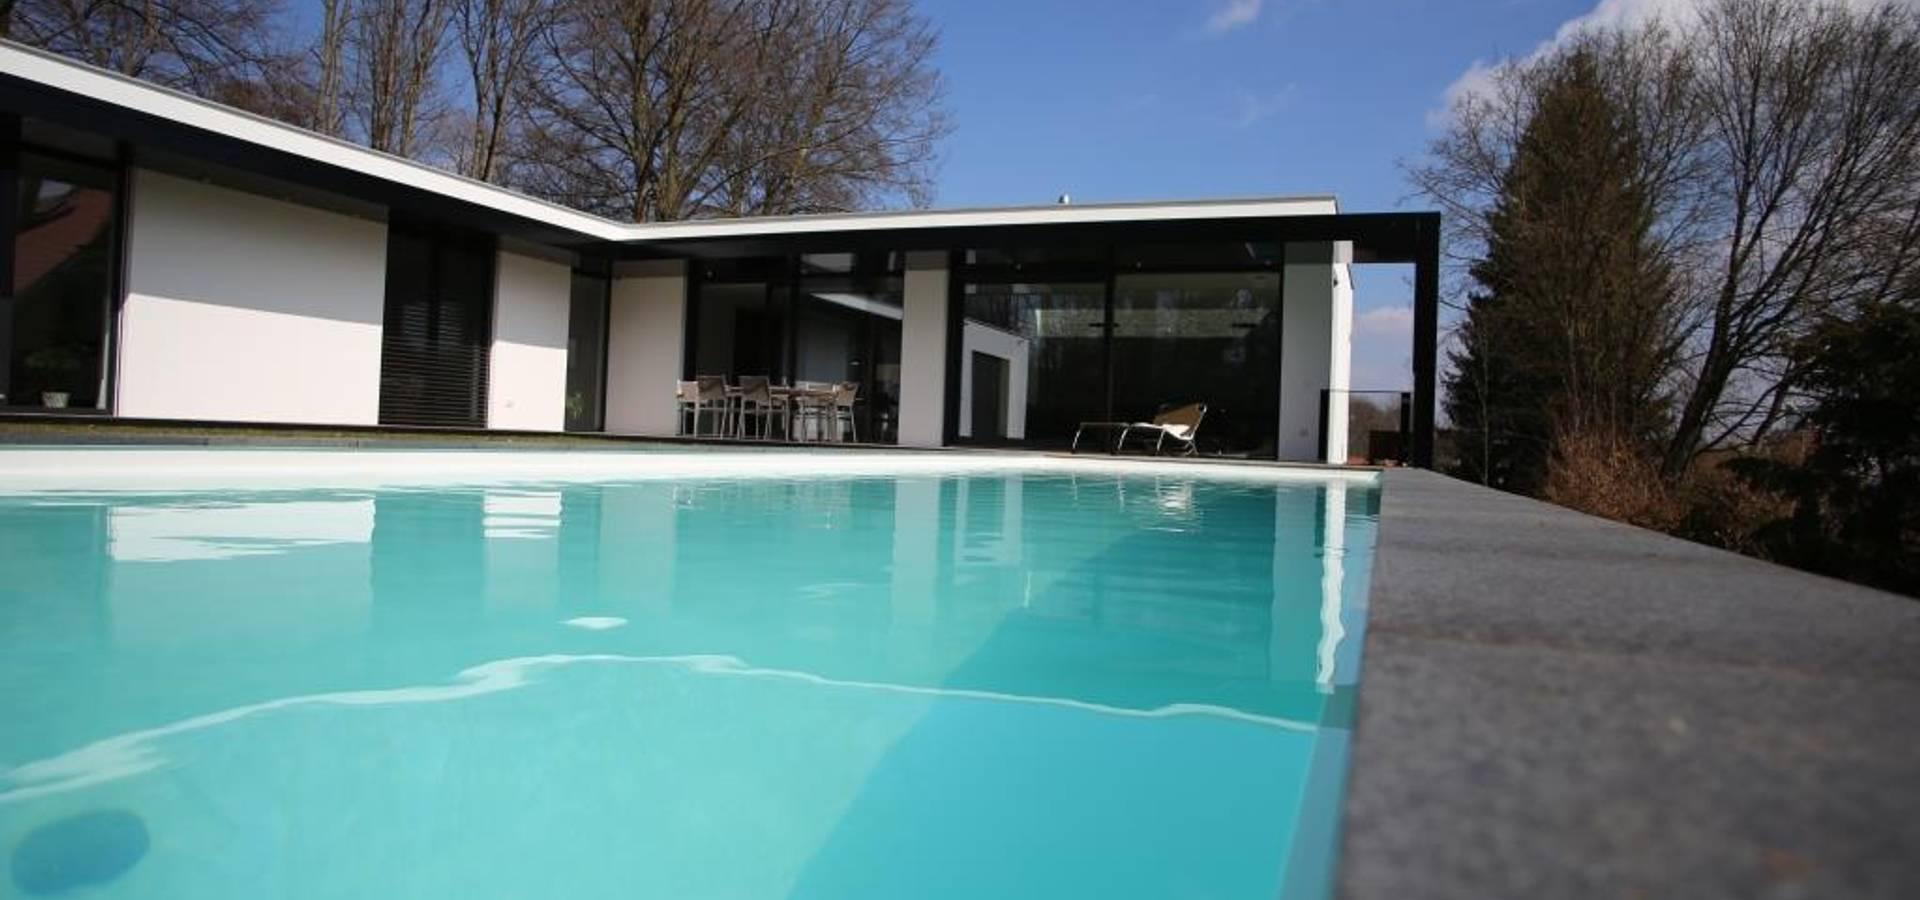 huaber more architekten in starnberg homify. Black Bedroom Furniture Sets. Home Design Ideas